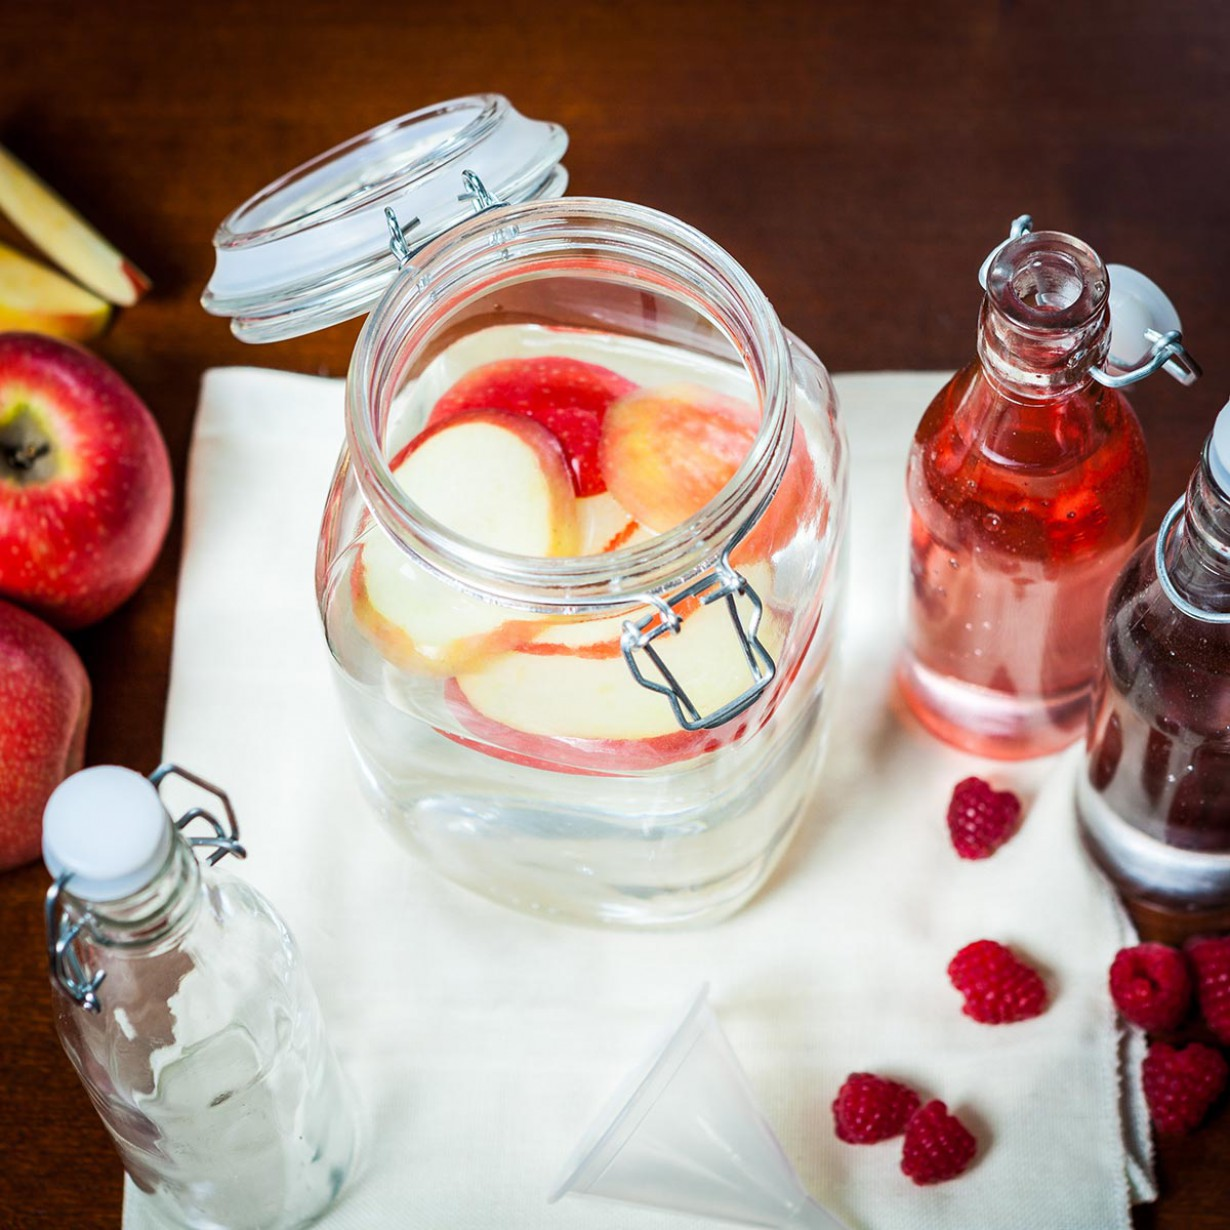 kit d'infusion vodka